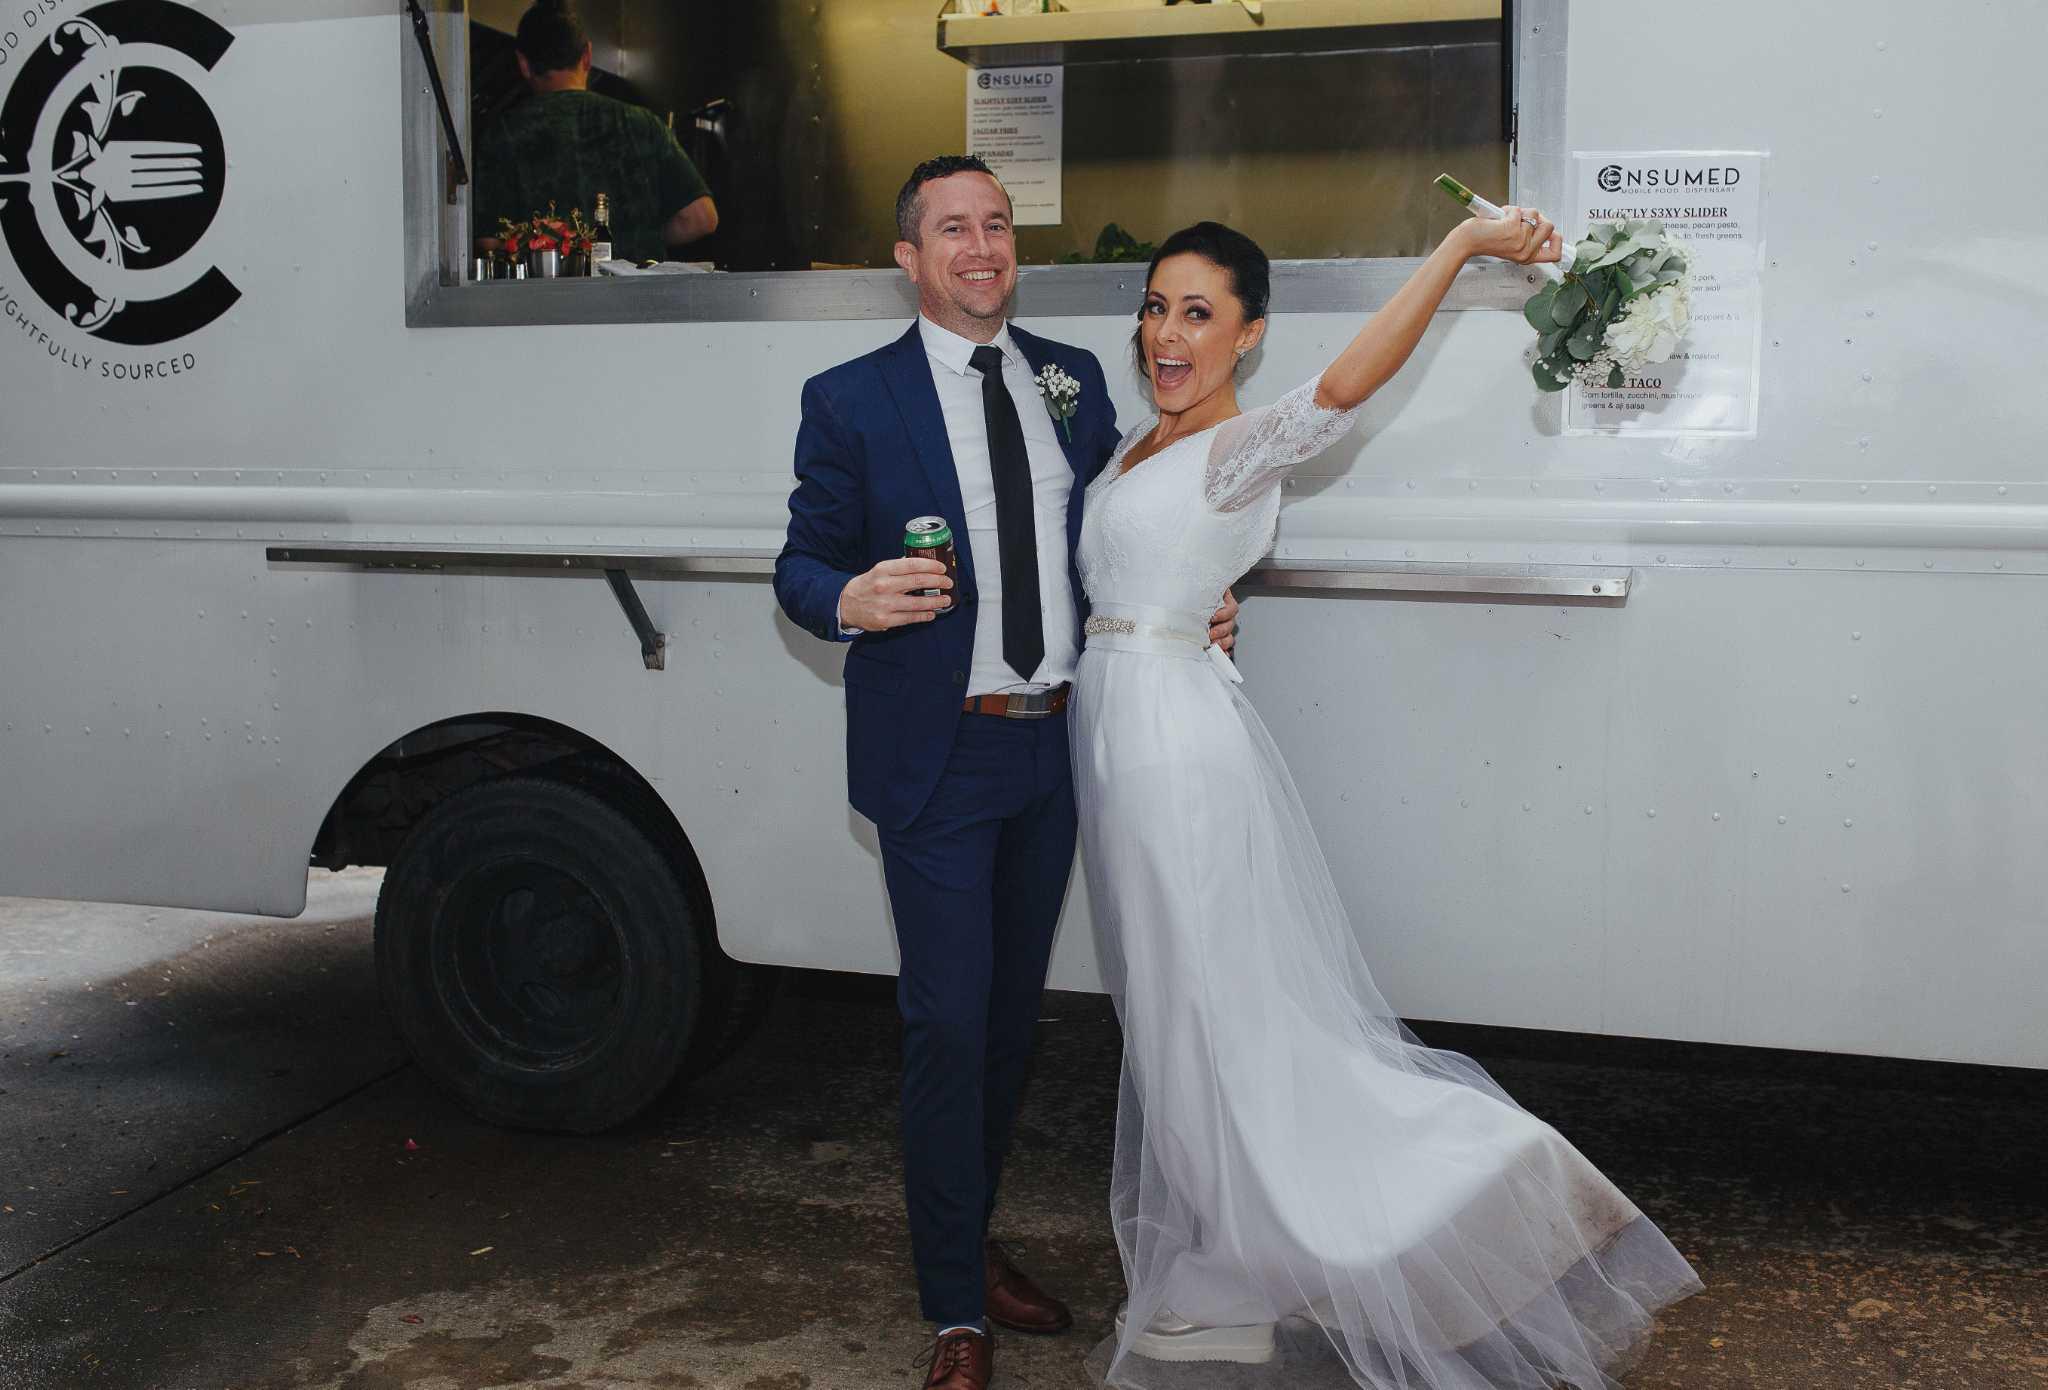 Food trucks becoming wedding fixtures - Times Union